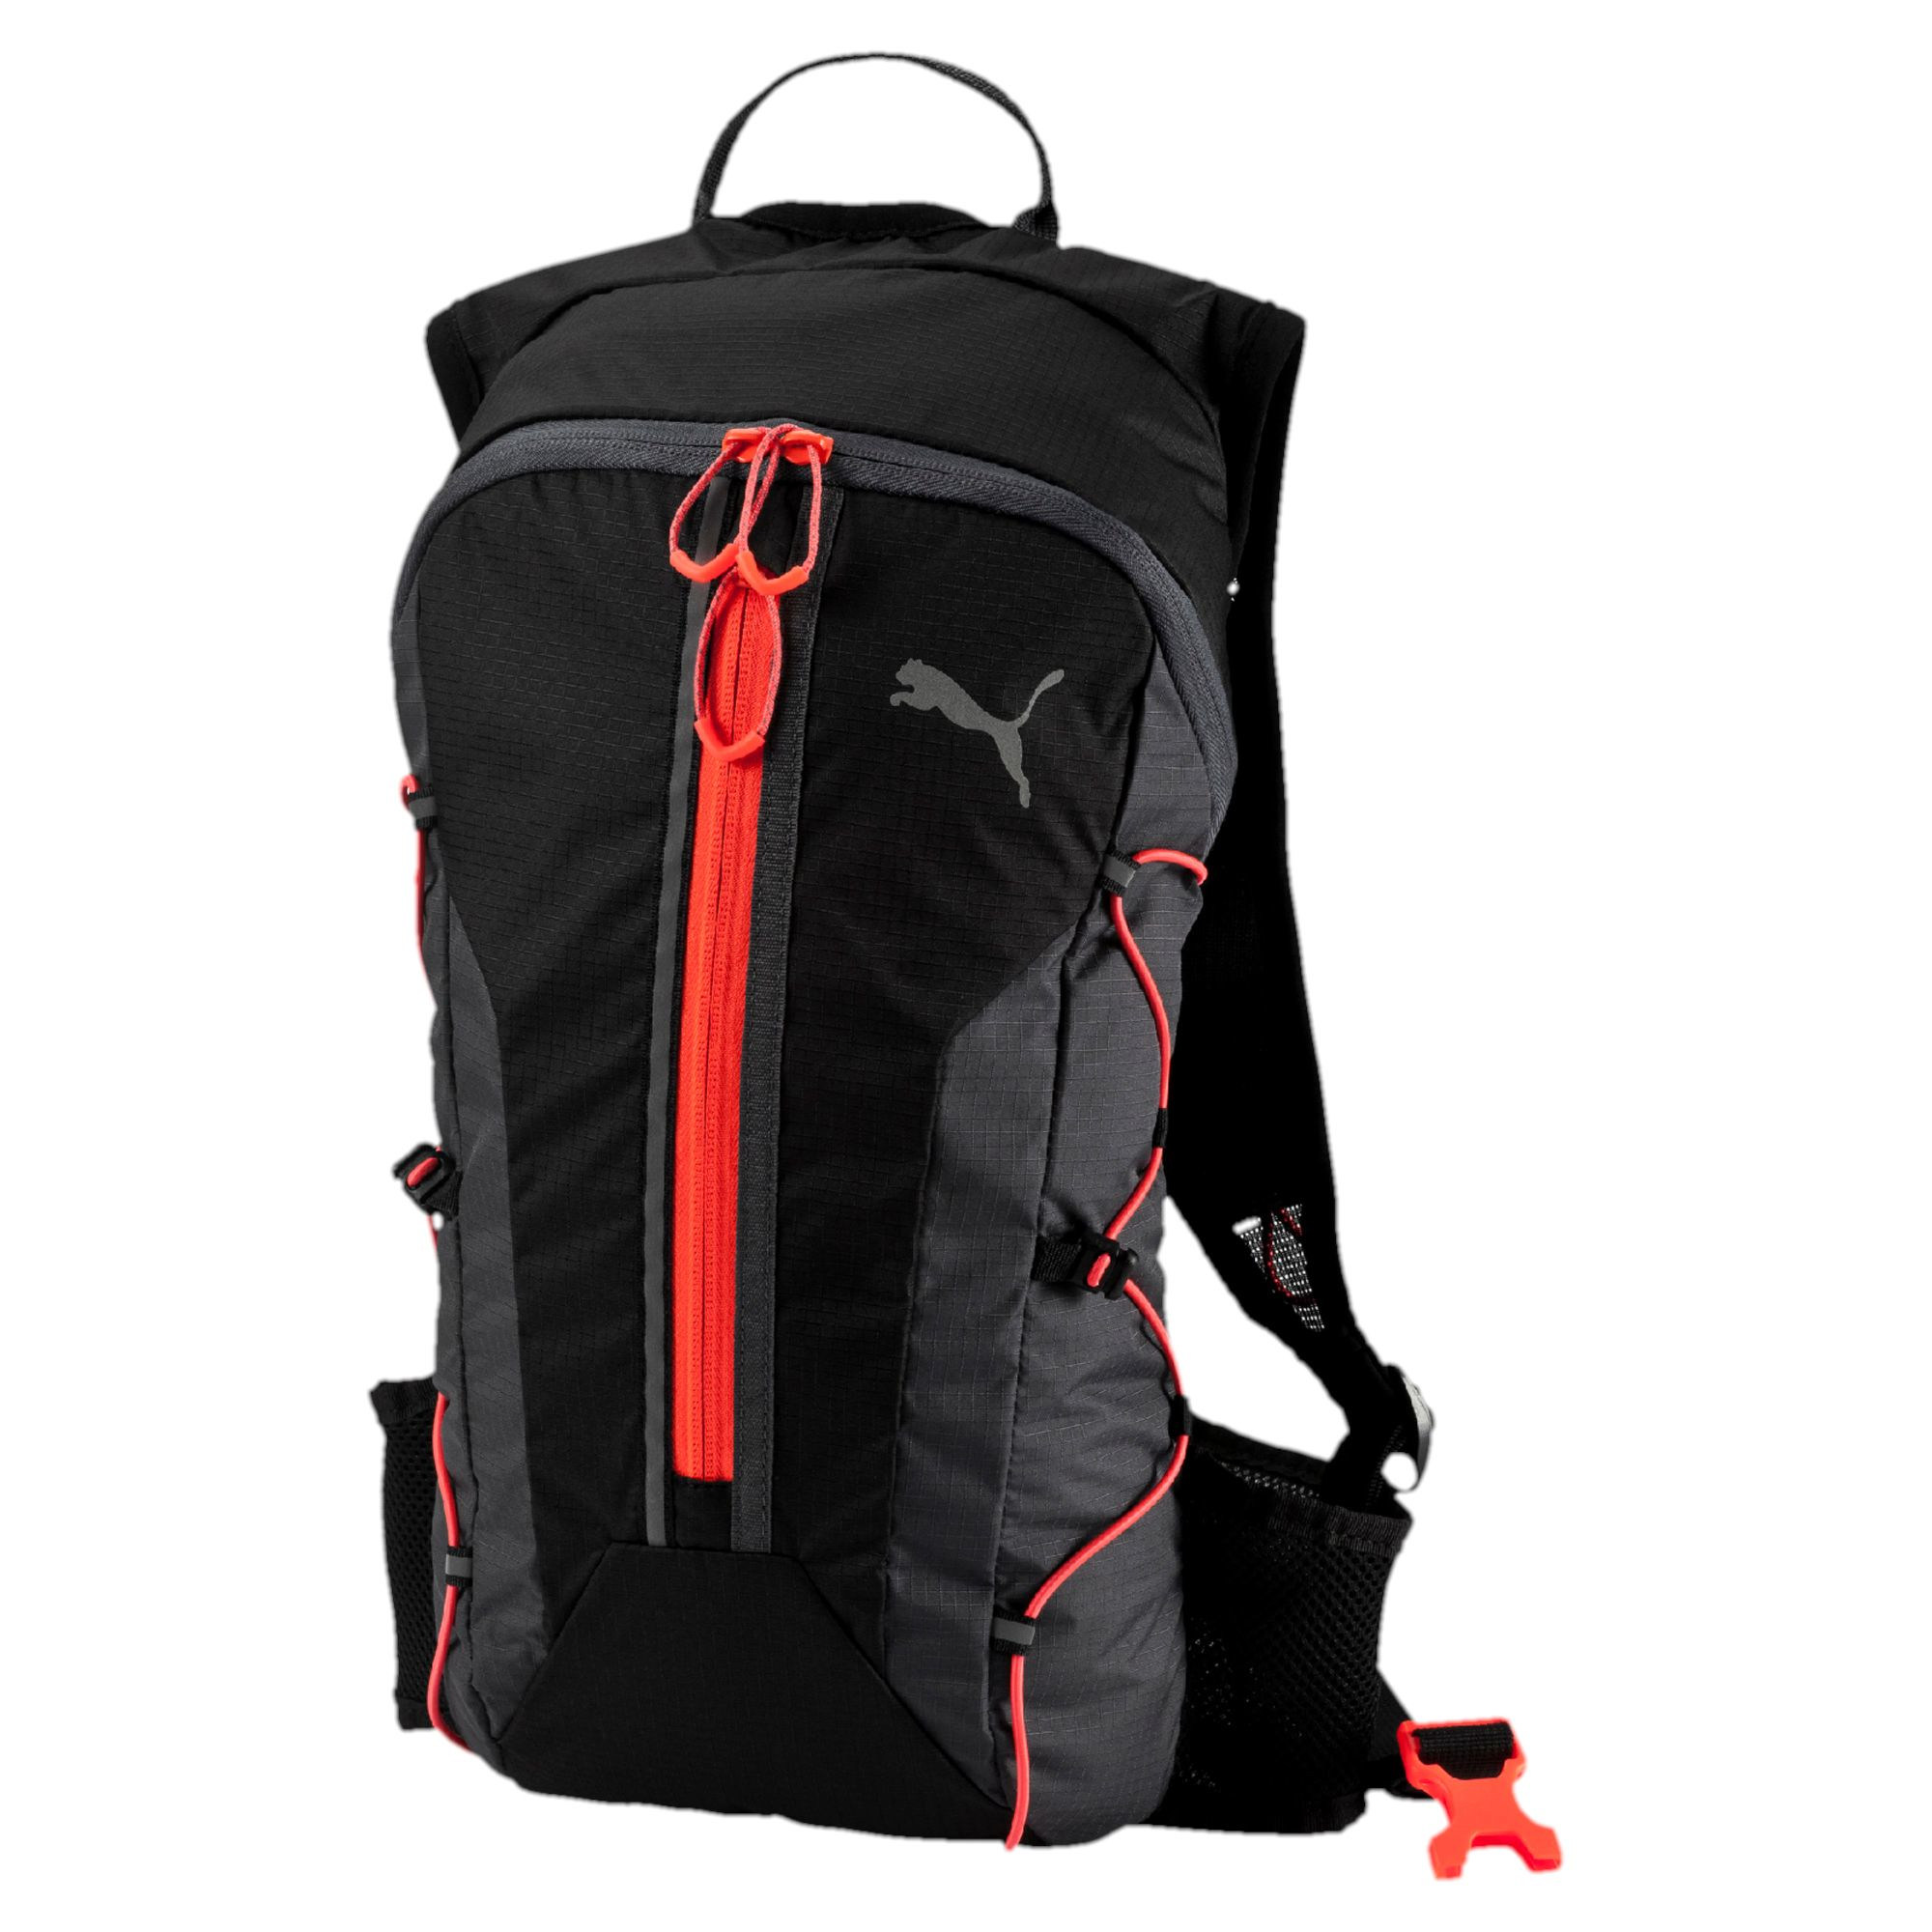 07588daebb7 Lyst - PUMA Lightweight Running Backpack for Men